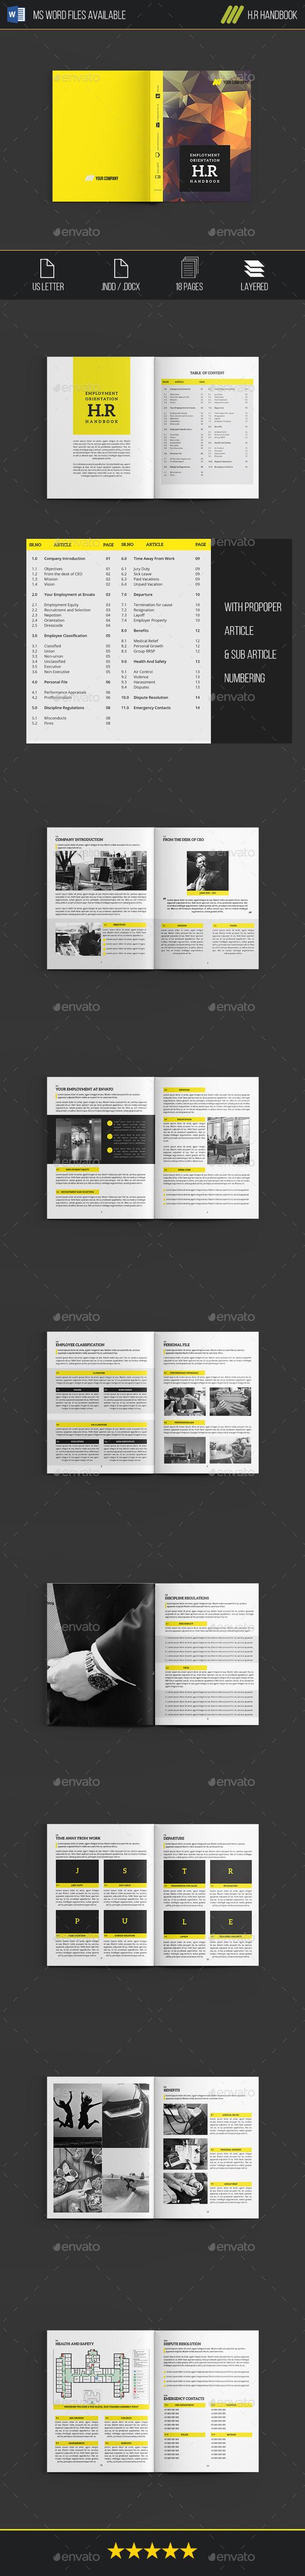 H.R Handbook | Template, Brochures and Brochure template